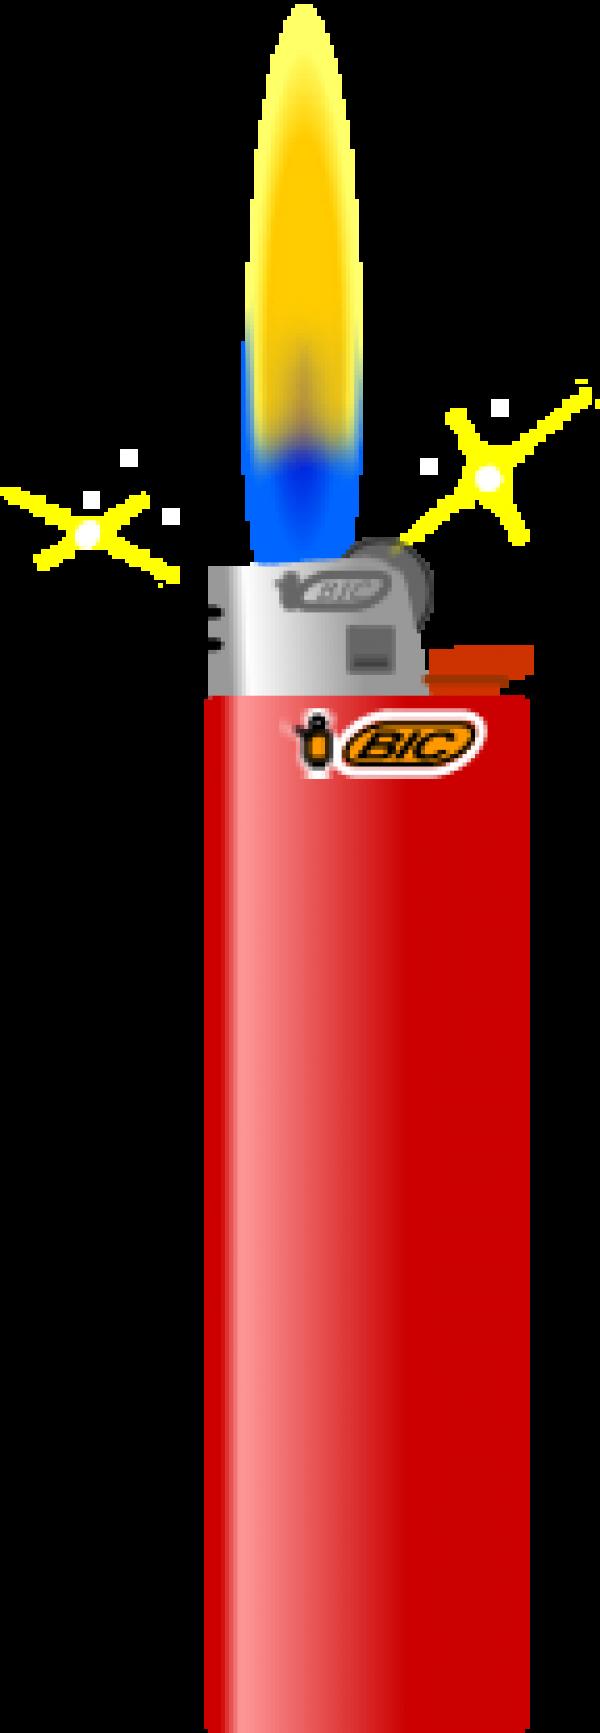 Lighter PNG Free Download 2